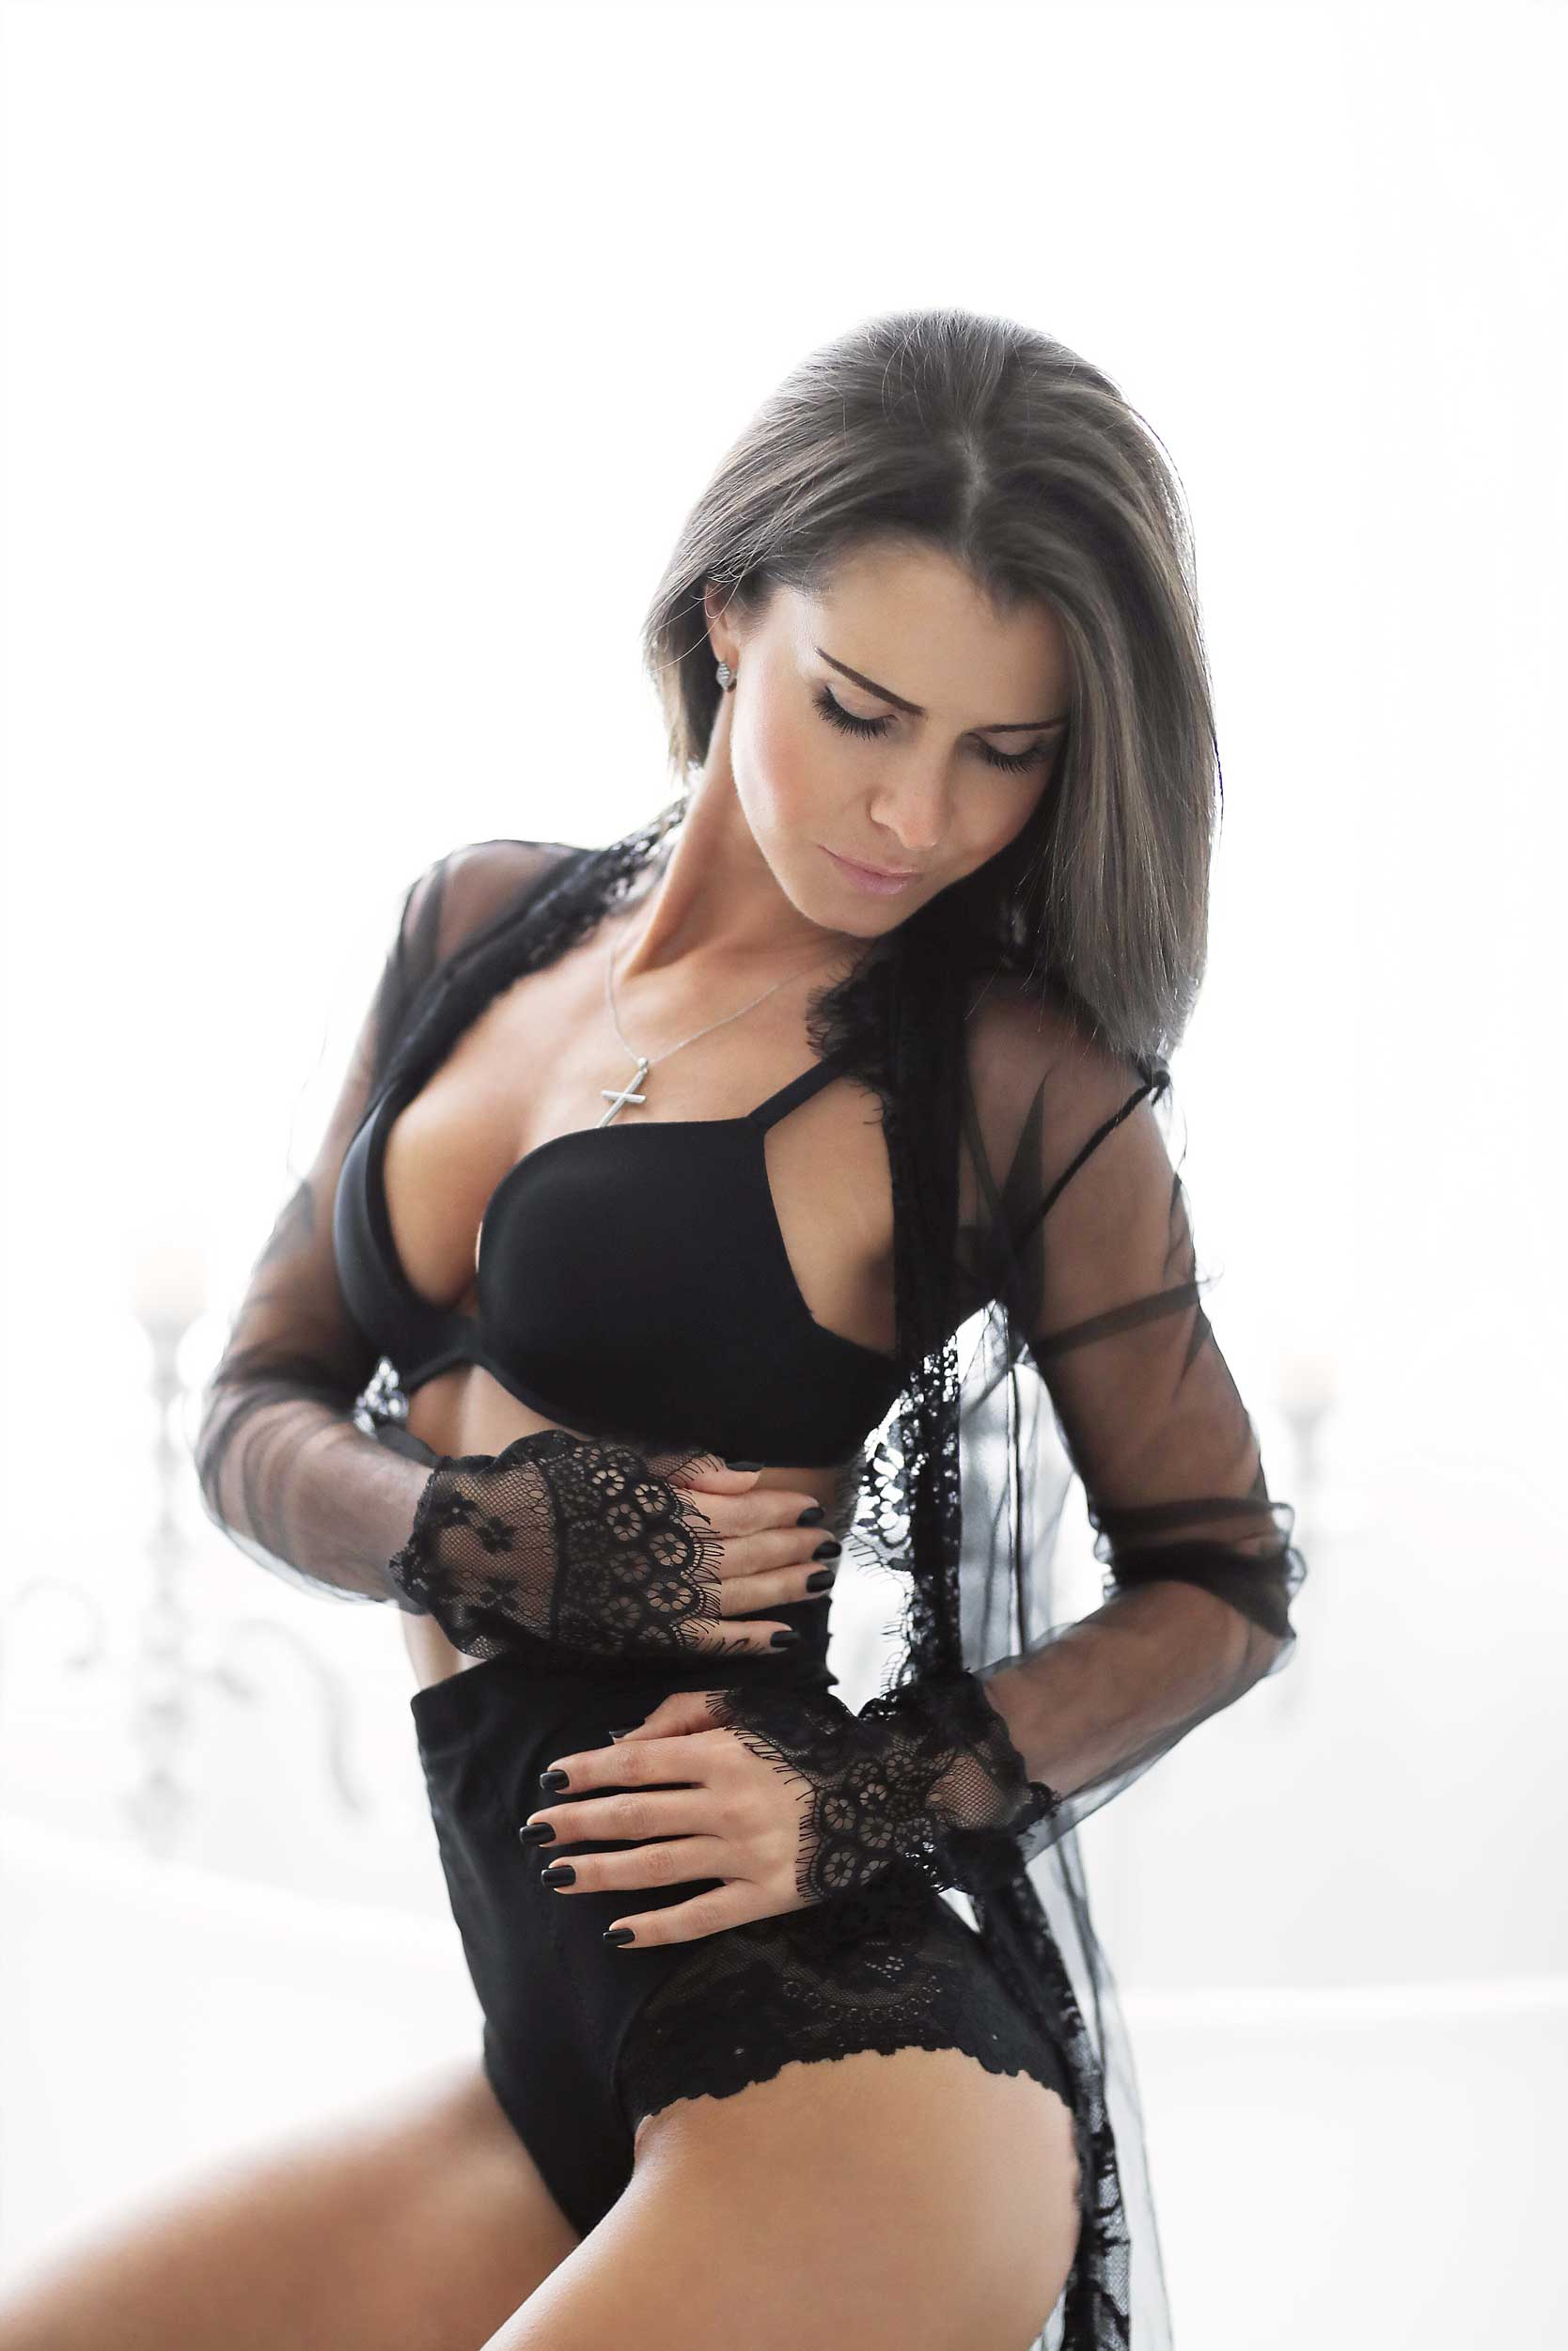 Brunette Woman with Breast Augmentation | Elite Plastic Surgery | Breast Lift | Phoenix, AZ